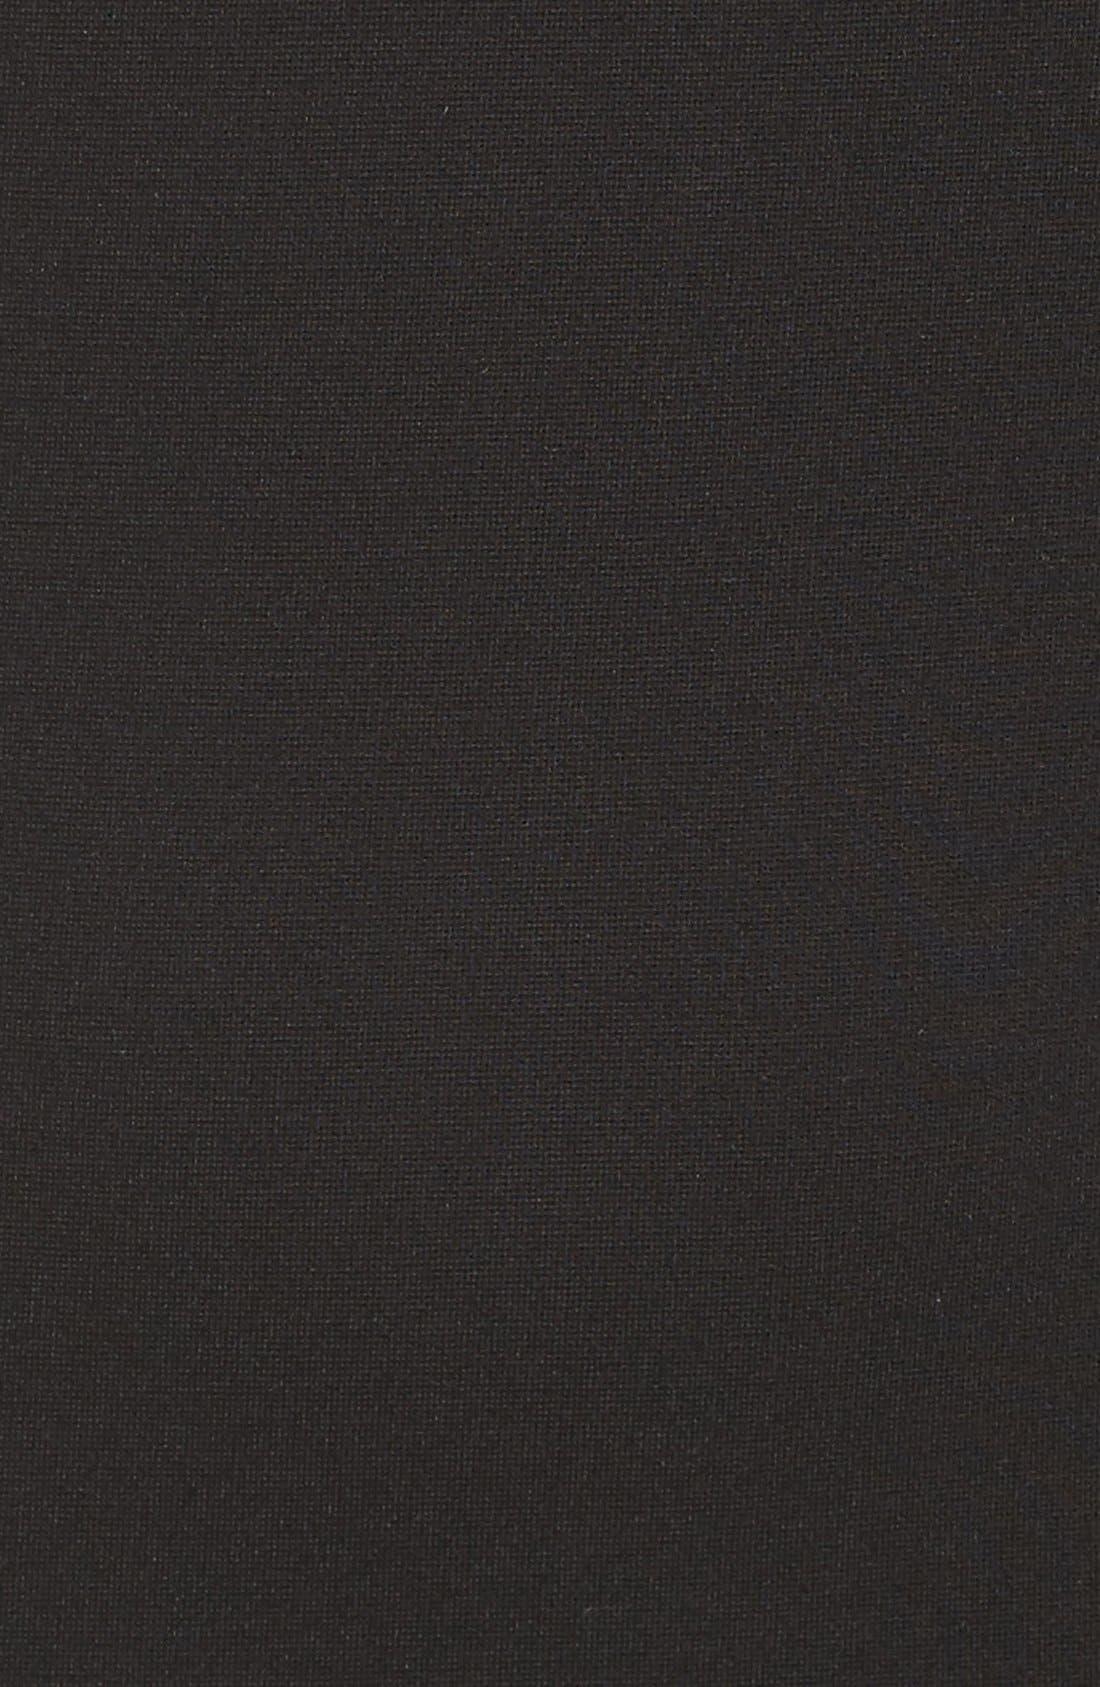 FELICITY & COCO, Shoulder Detail Ponte Sheath Dress, Alternate thumbnail 3, color, 001